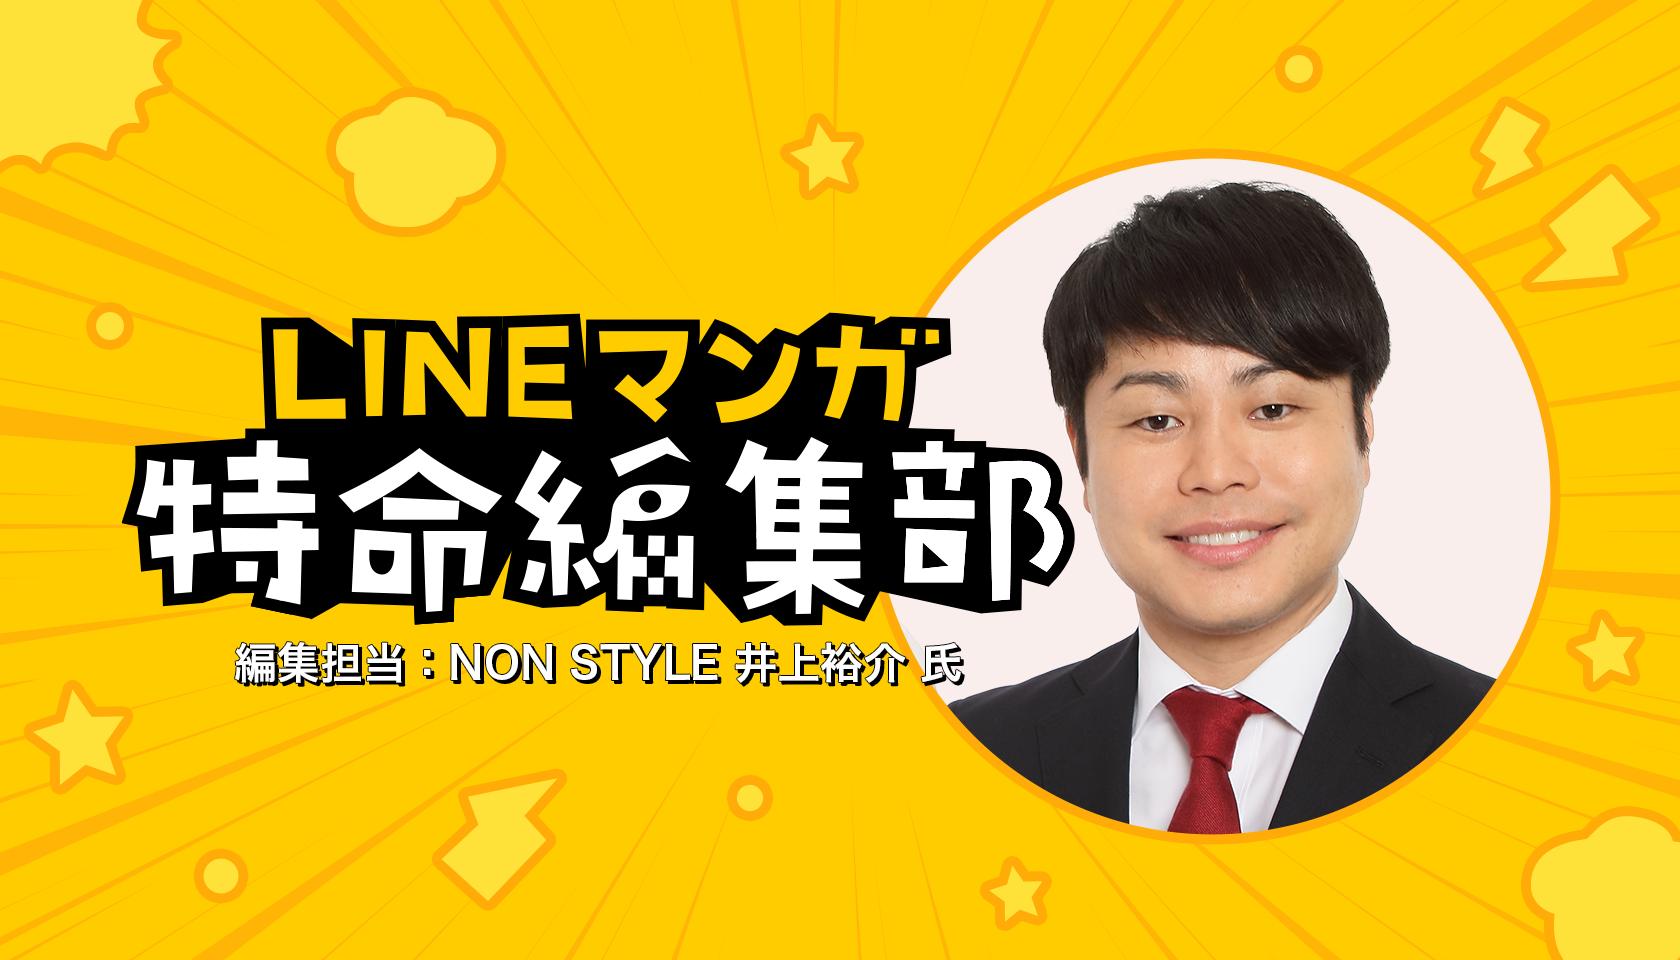 /stf/linecorp/ja/pr/0701_LINE-Manga_image01.png